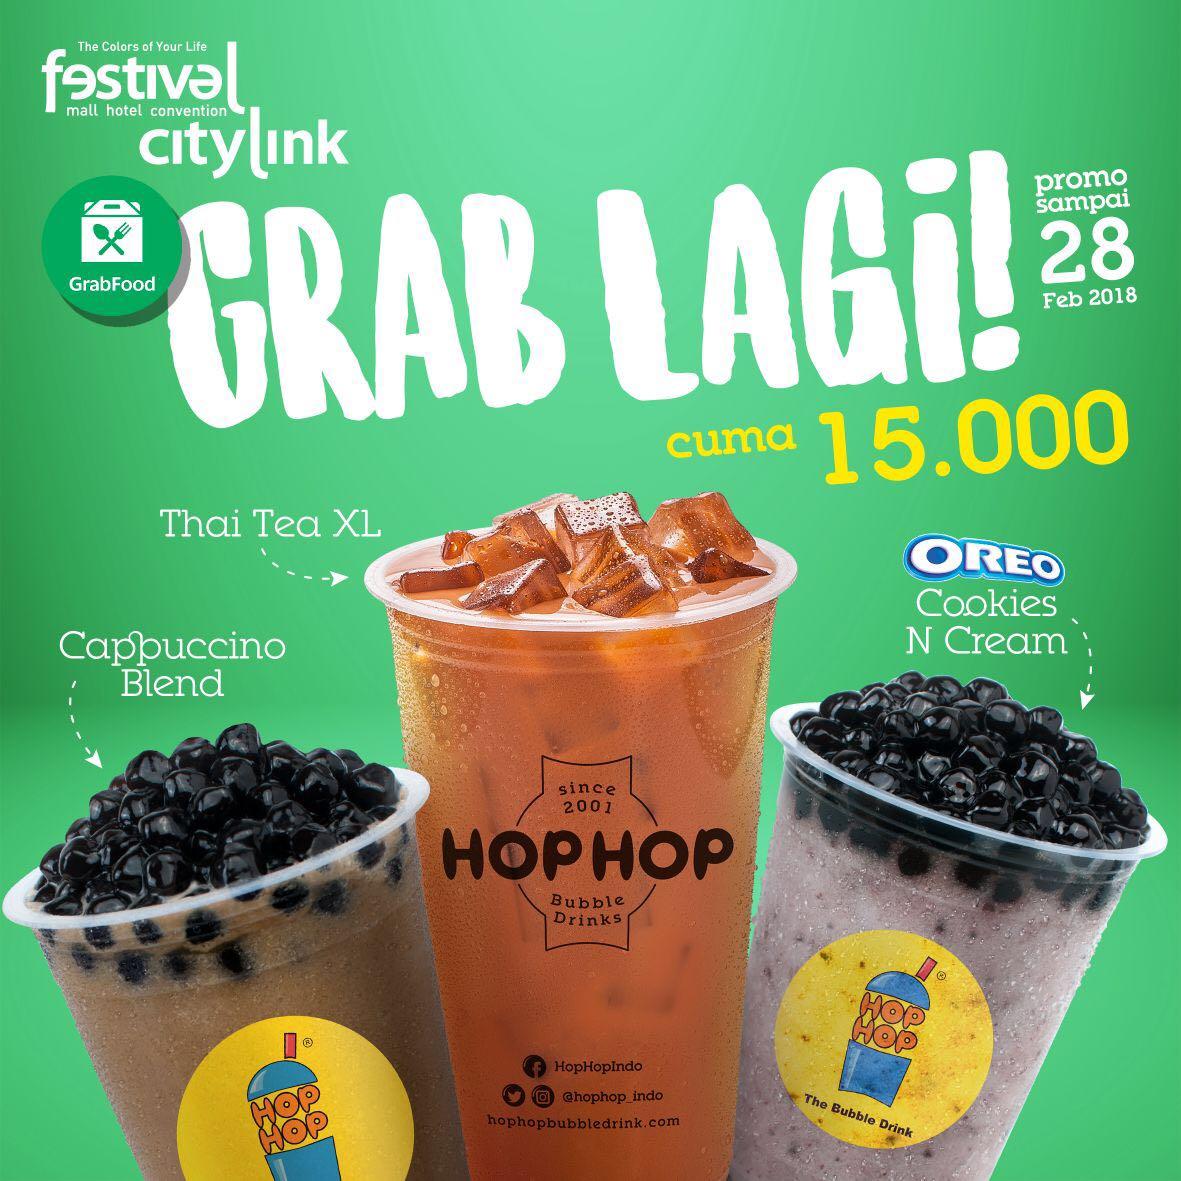 Hophop E Voucher 23k Review Harga Terkini Dan Terlengkap Indonesia 200 Double Point Sticker Tiara Gatzu Monang Maning Toko Soputan Promo Hingga 28 Feb 2018 Hop Indo Terrazo Food Venue